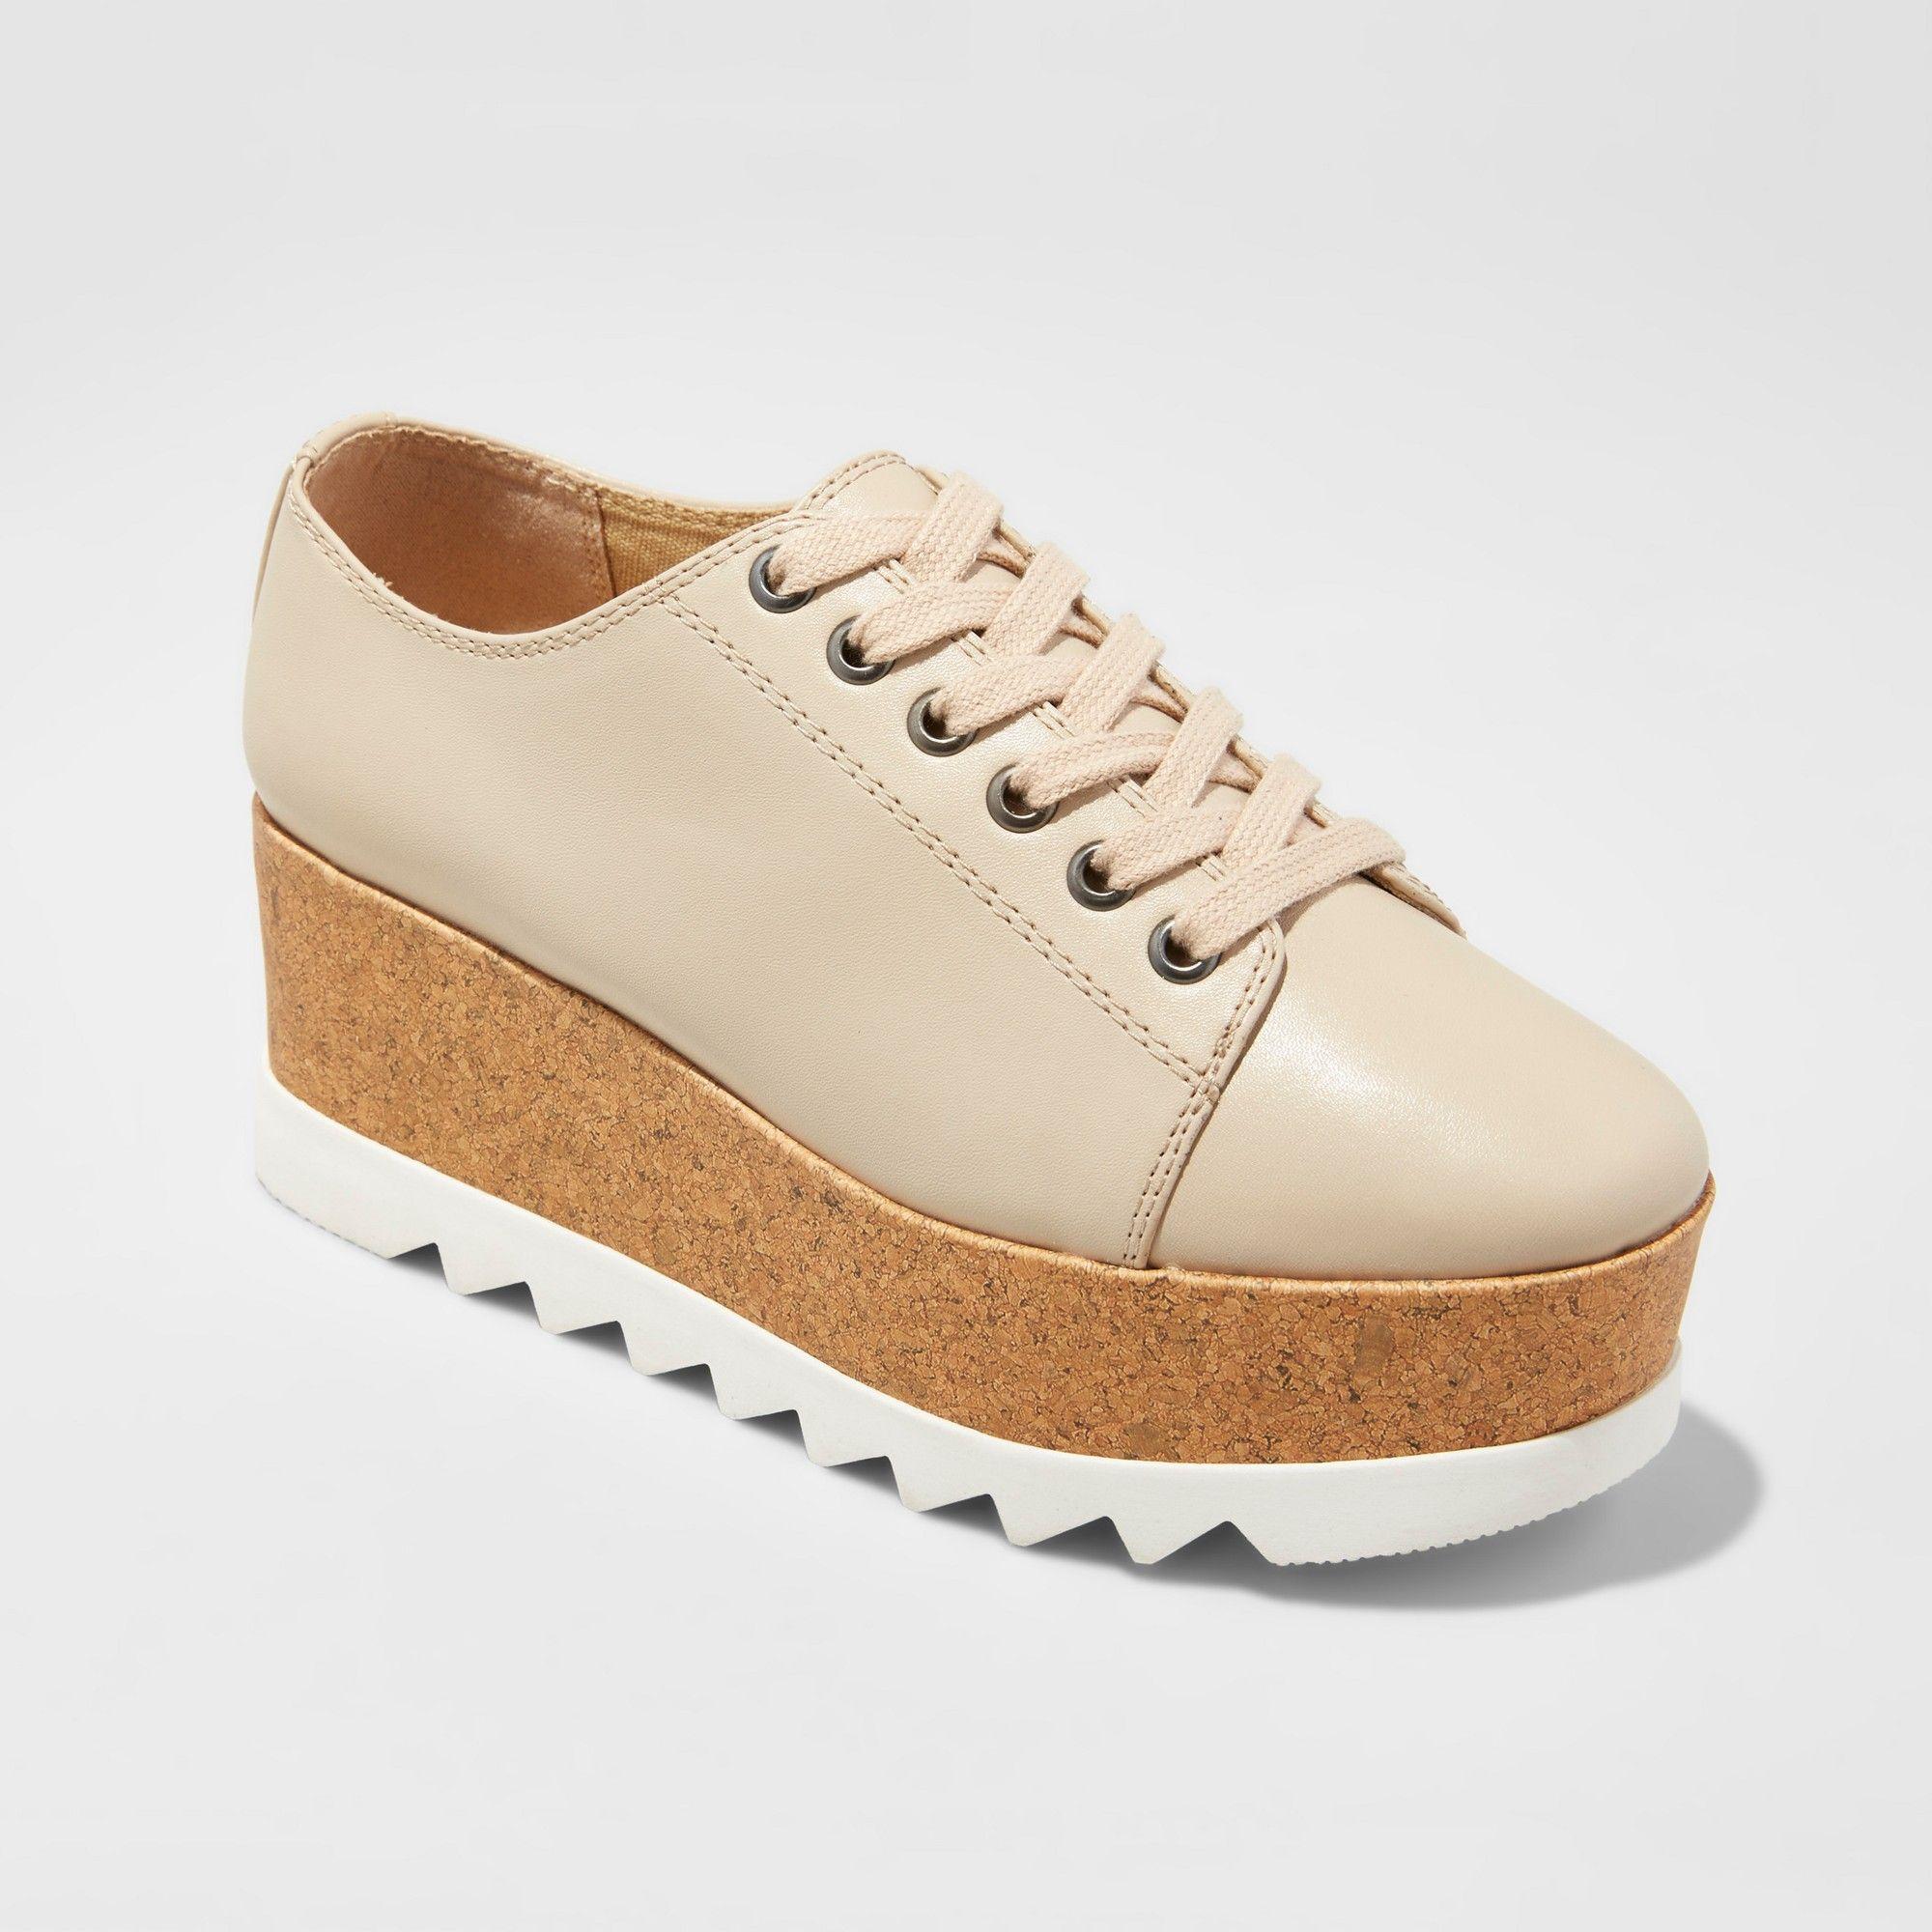 Women s Juniper Platform Oxford Shoes Mossimo Supply Co Tan 7 5